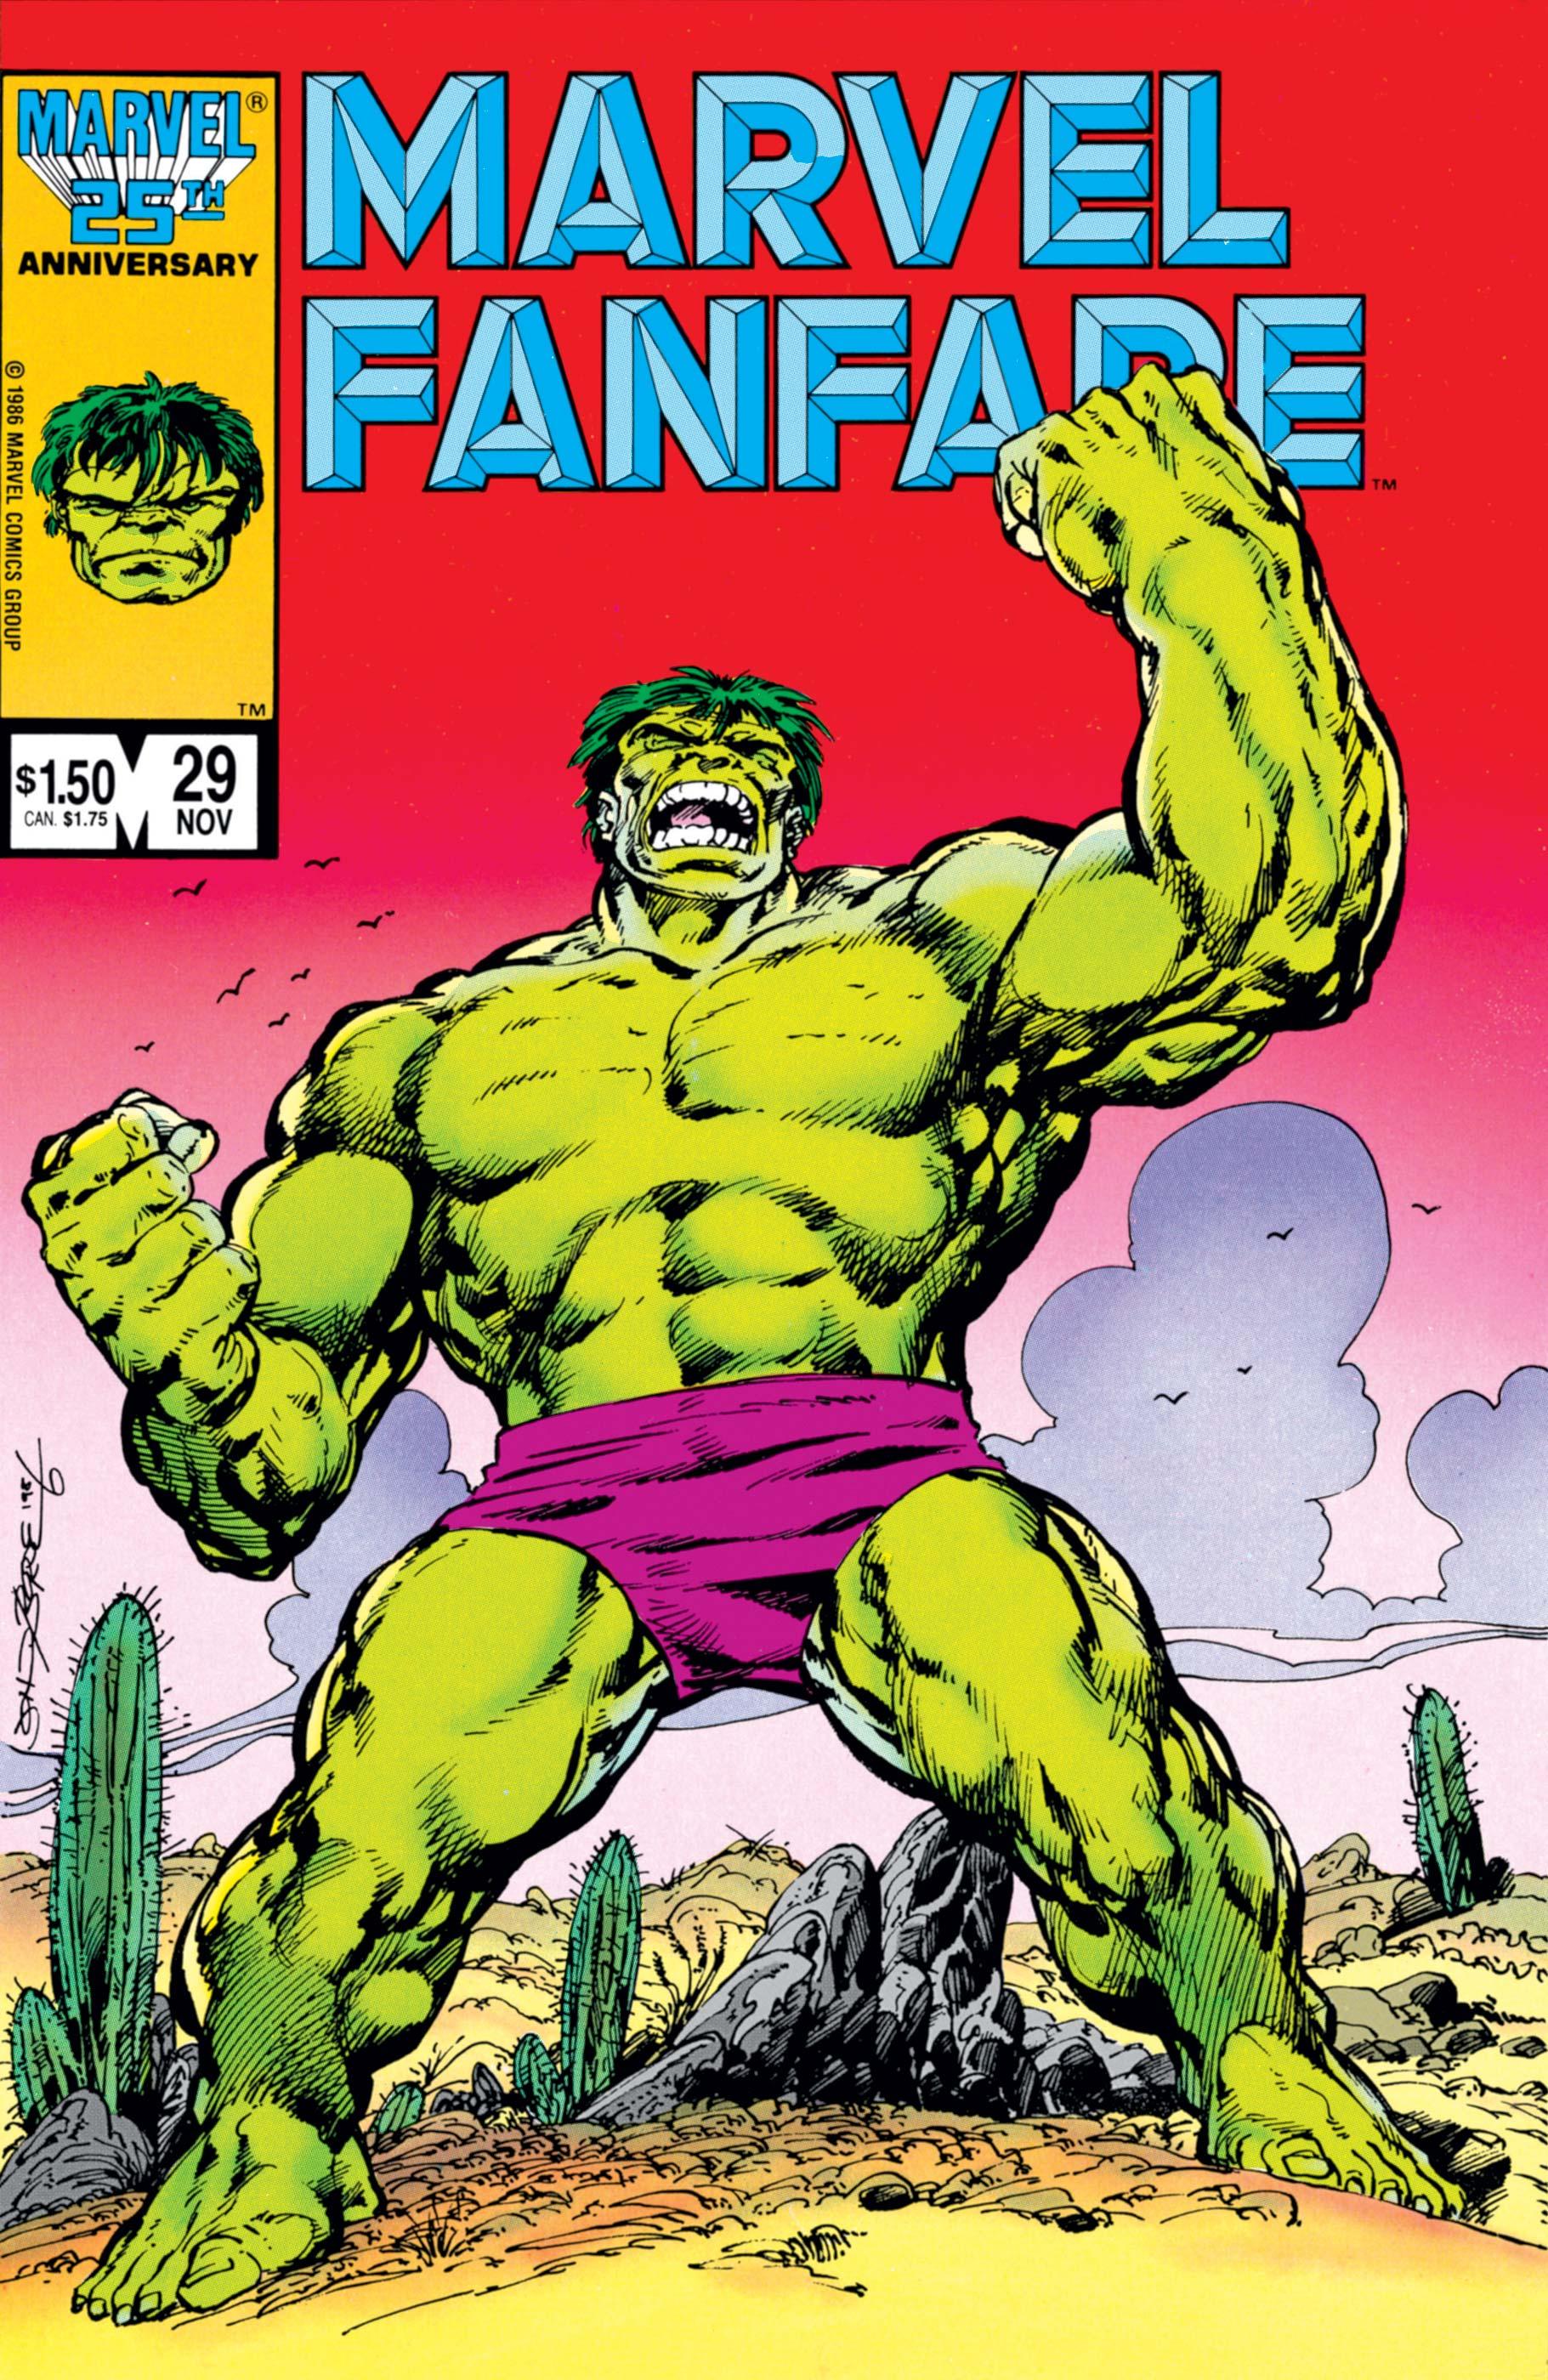 Marvel Fanfare (1982) #29